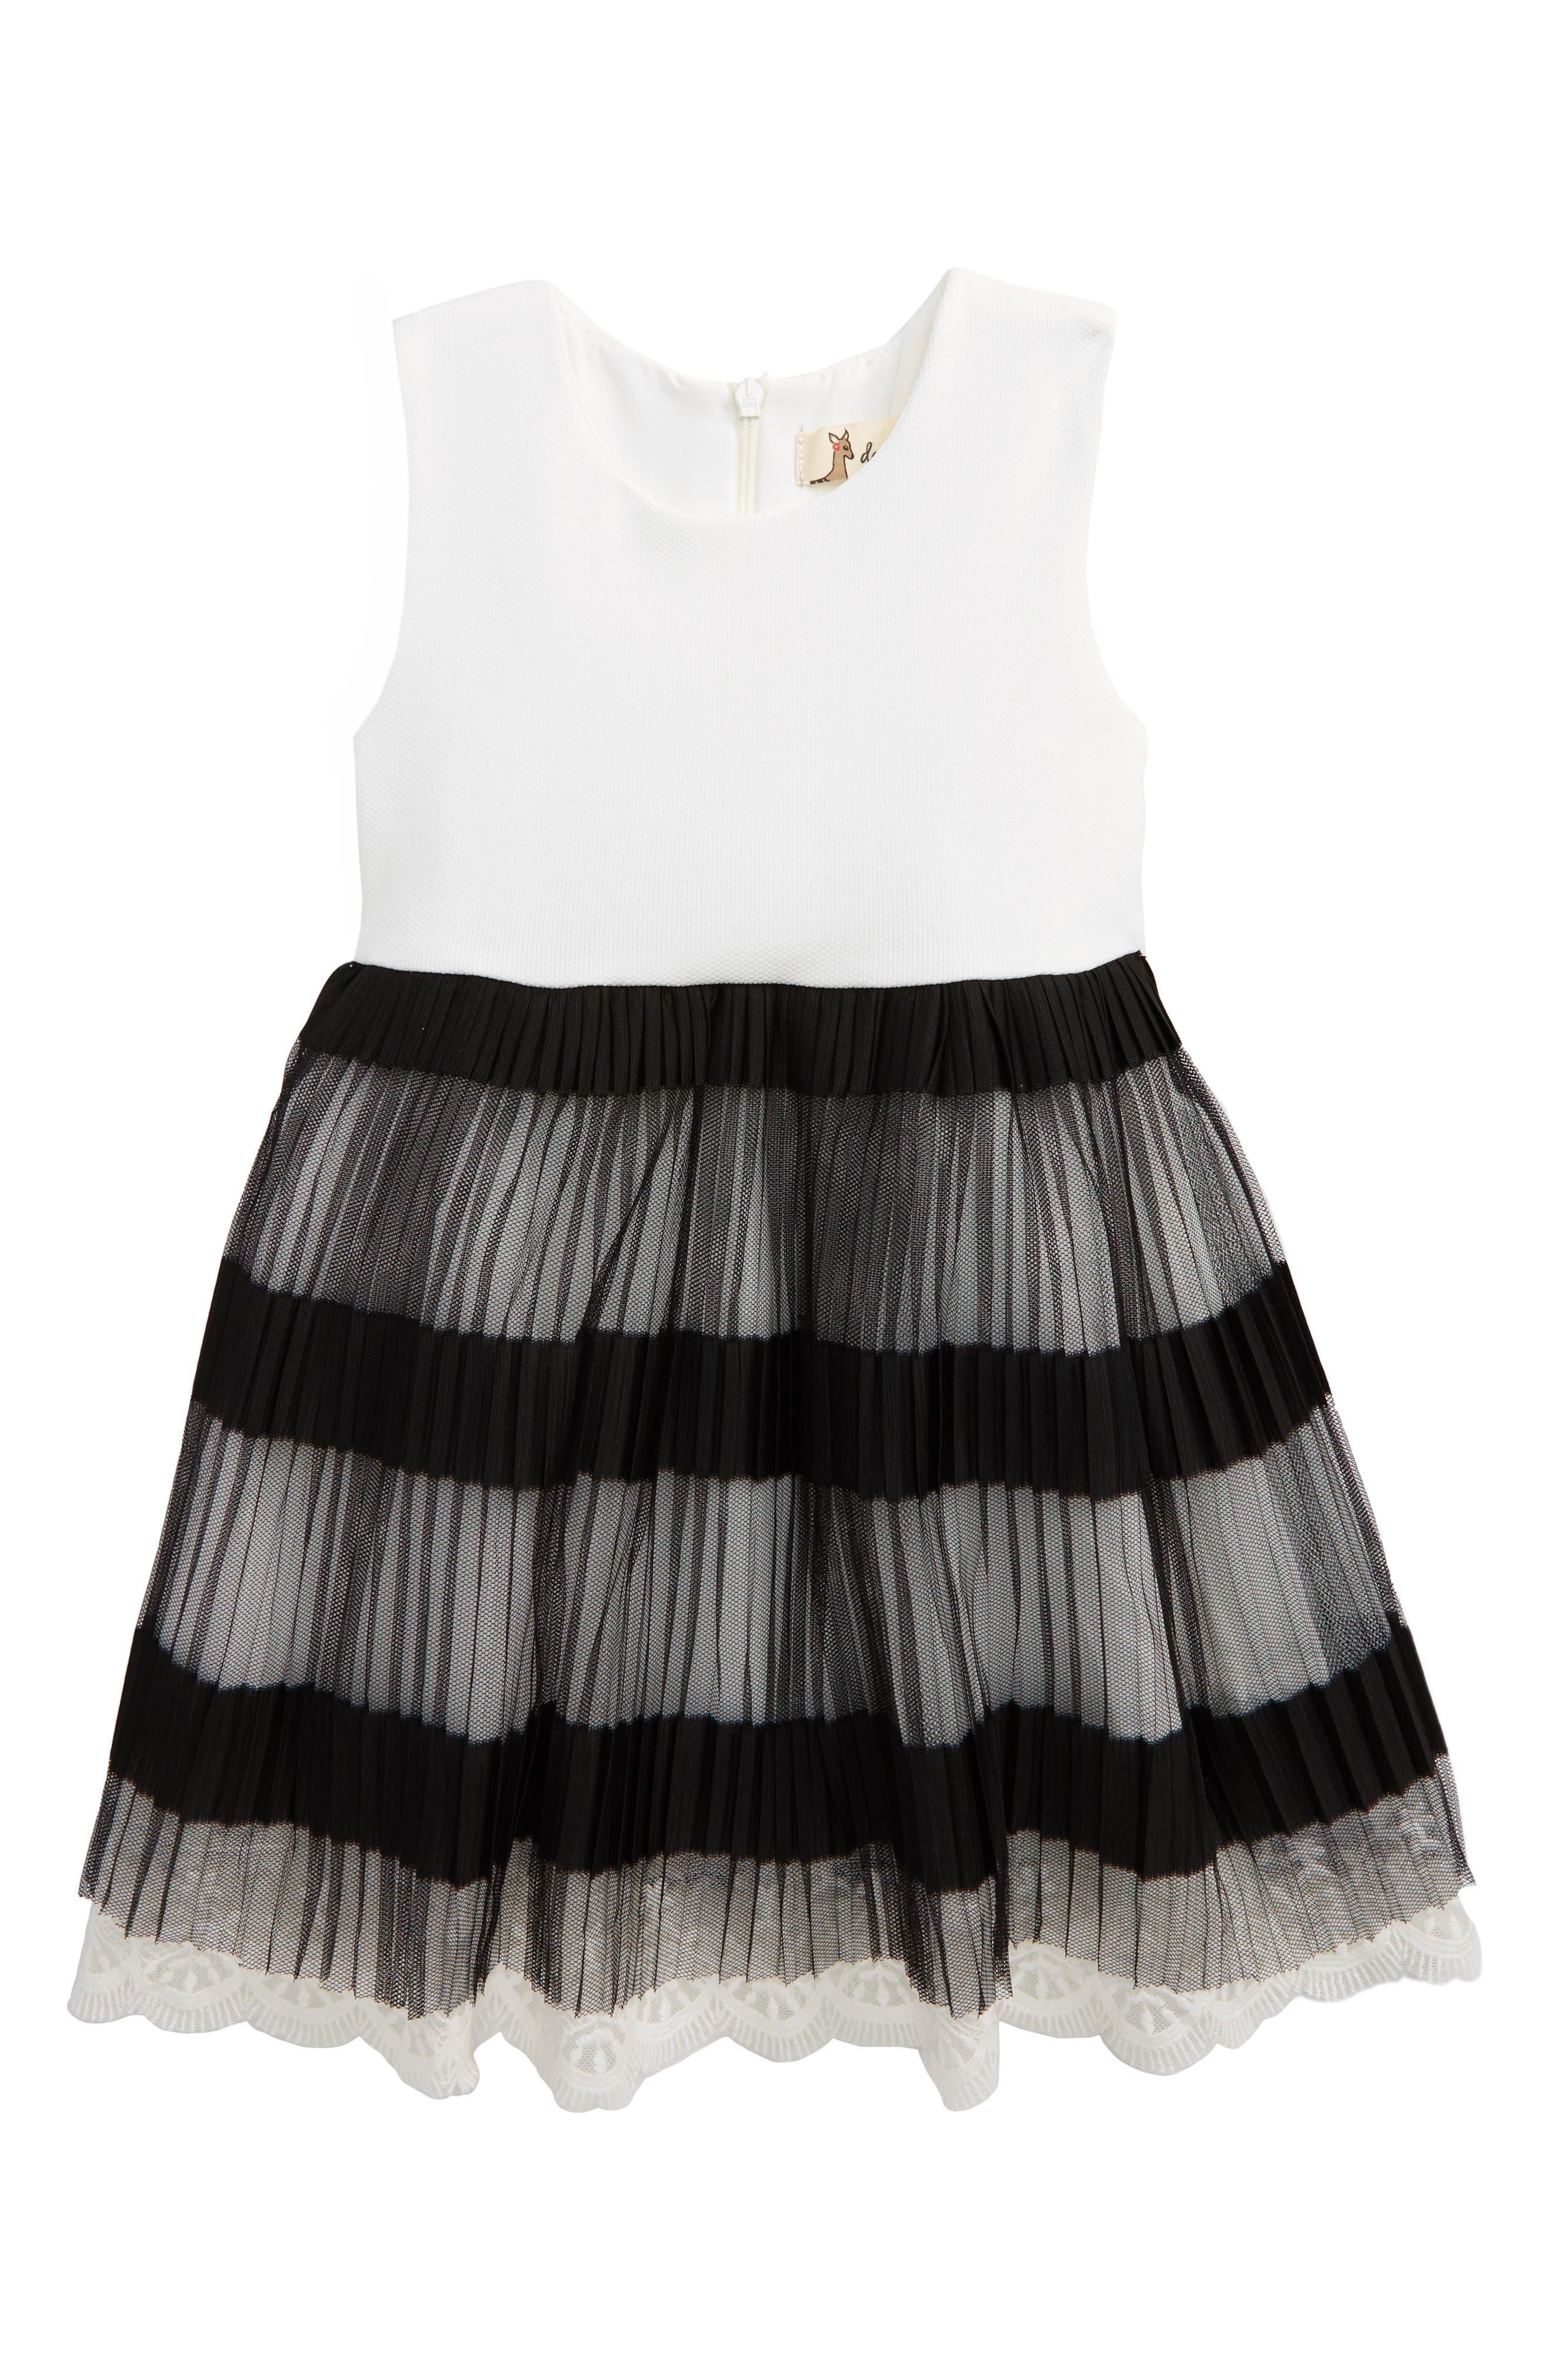 Alternate Image 1 Selected - Doe A Dear Accordion Pleated Dress (Toddler Girls, Little Girls & Big Girls)